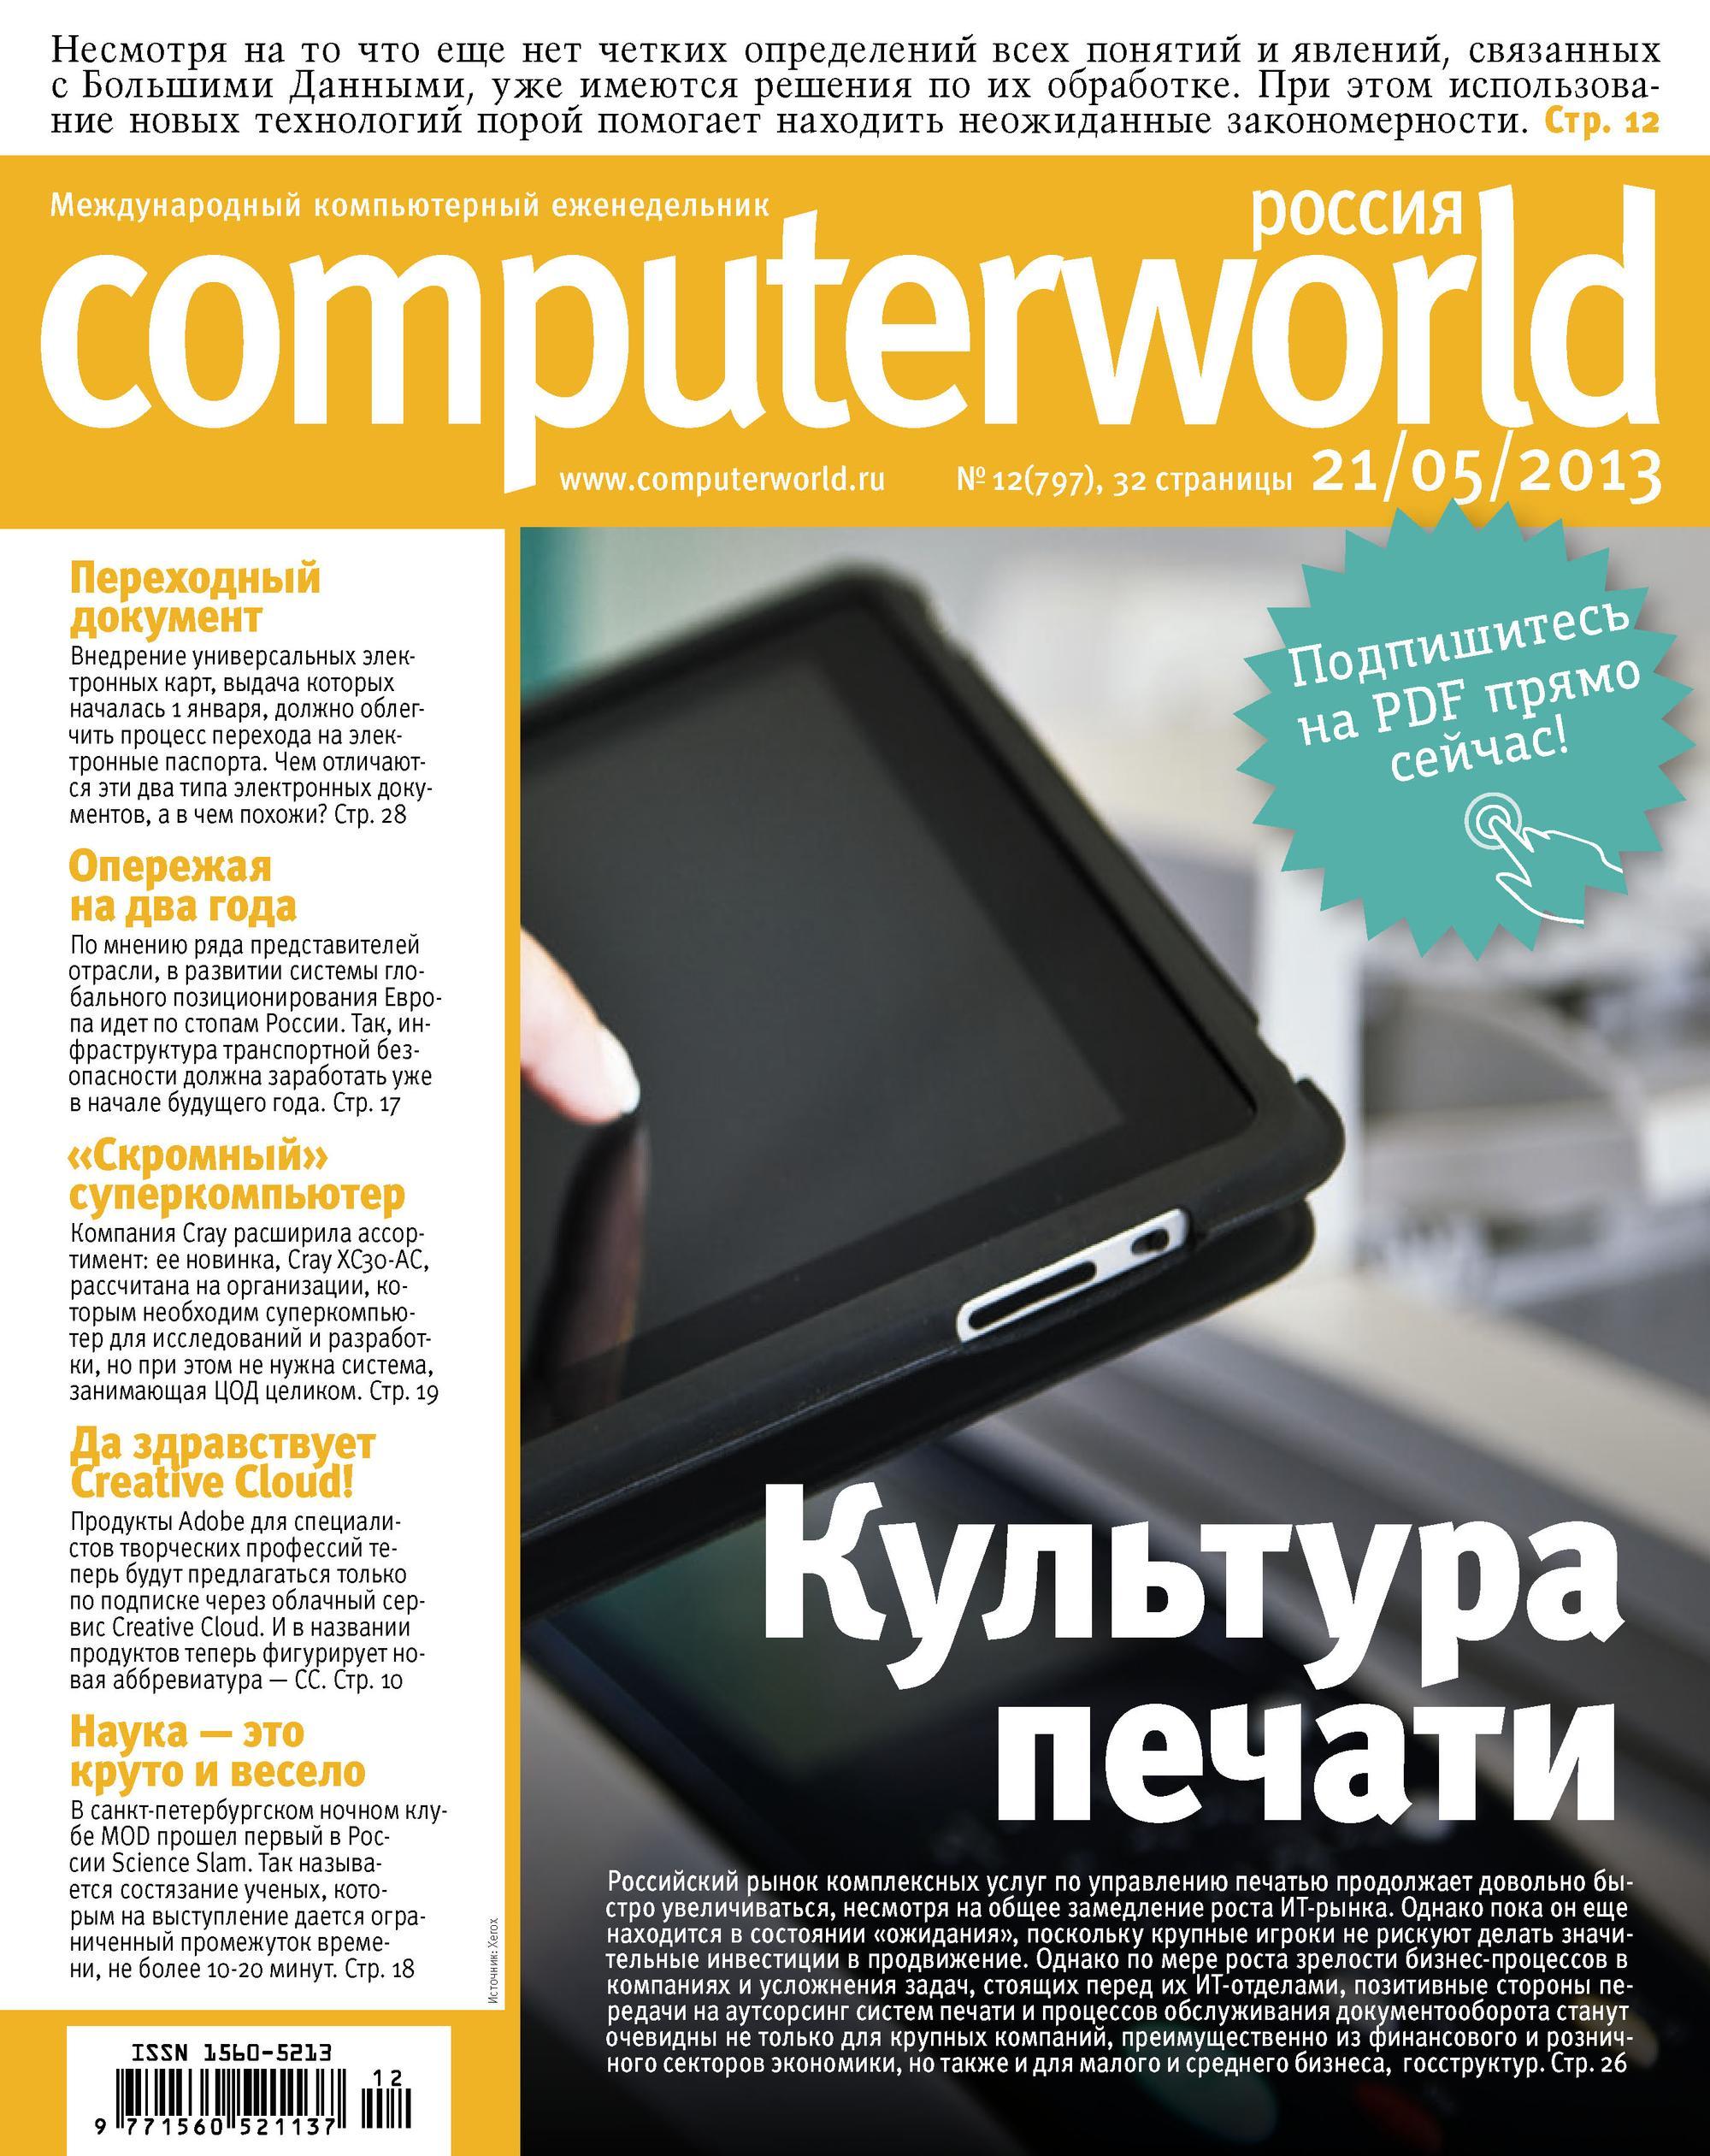 Журнал Computerworld Россия №12/2013